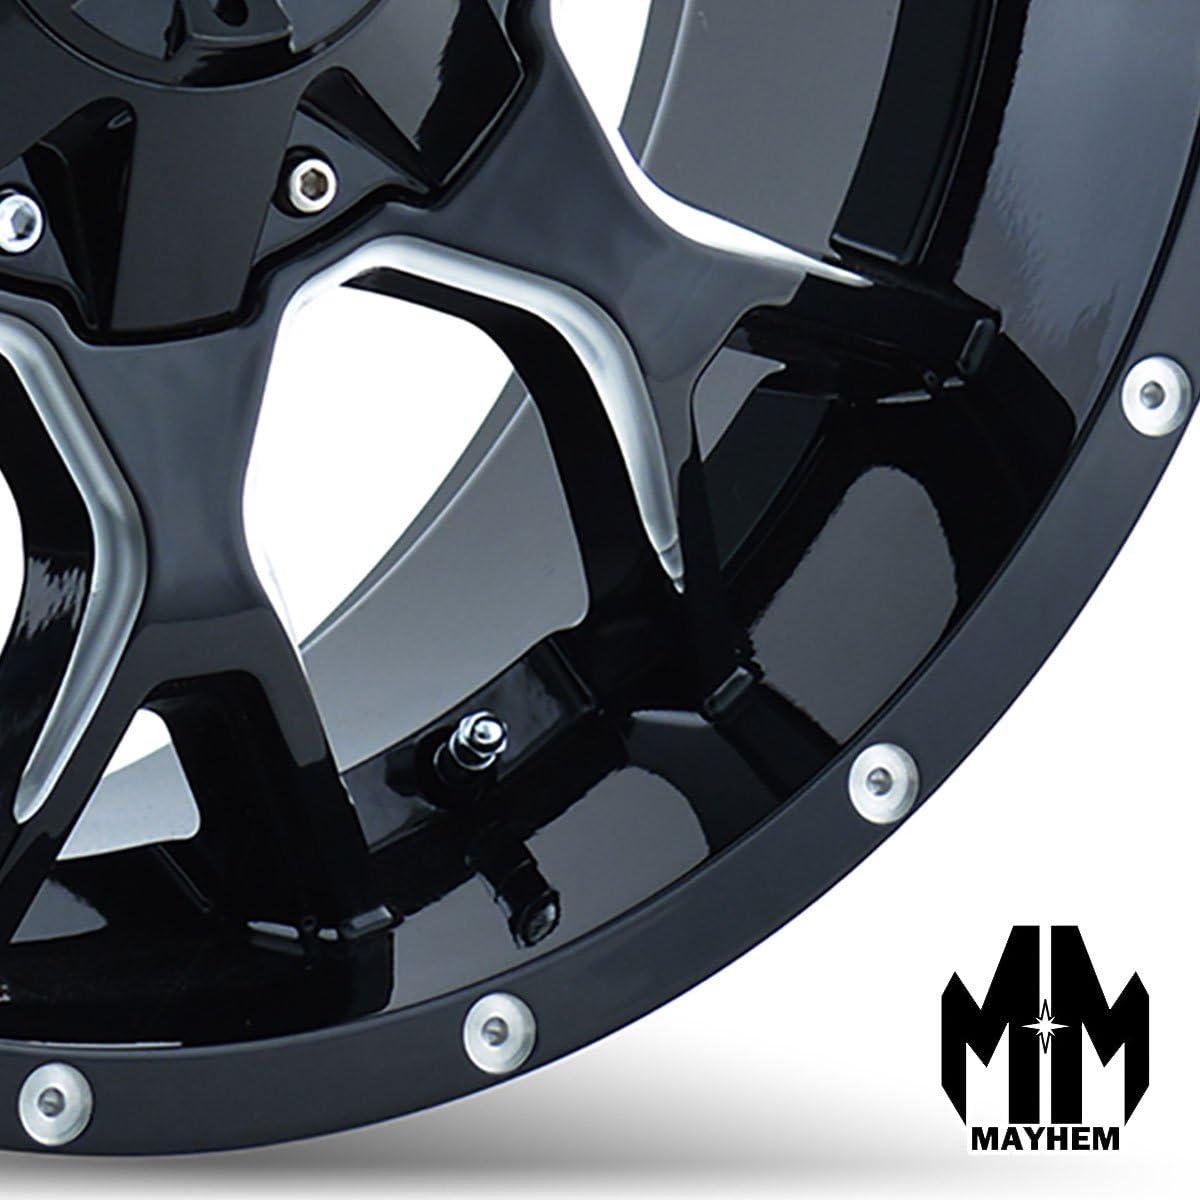 Brake Master Cylinder TRW oem for Porsche 996 986 w//o m476